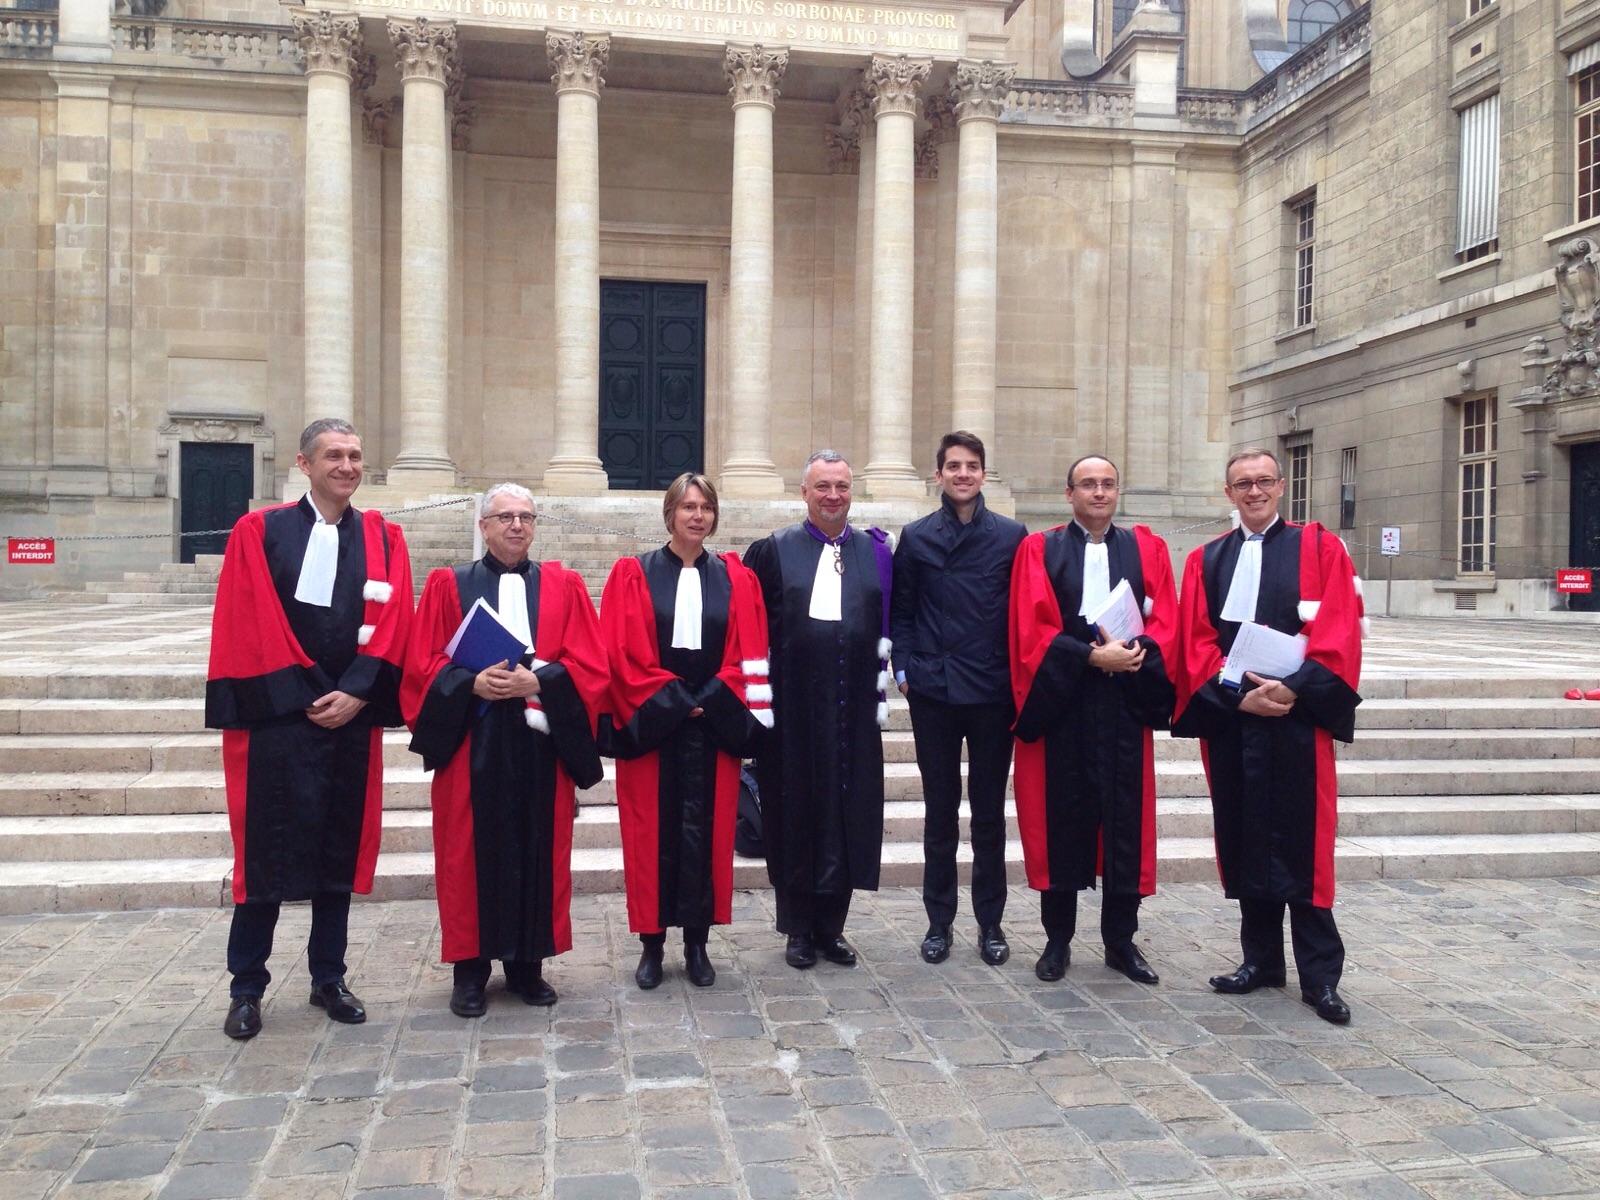 The jury: François Pétavy (CEO of eYeka), Prof. Decuadin (Toulouse University), Prof. Le Nagard (ESSEC Business School), Rector Steyer (Sorbonne University), me, Prof. Lemoine (Sorbonne University), Prof. Morisse (ESSCA School of Management)